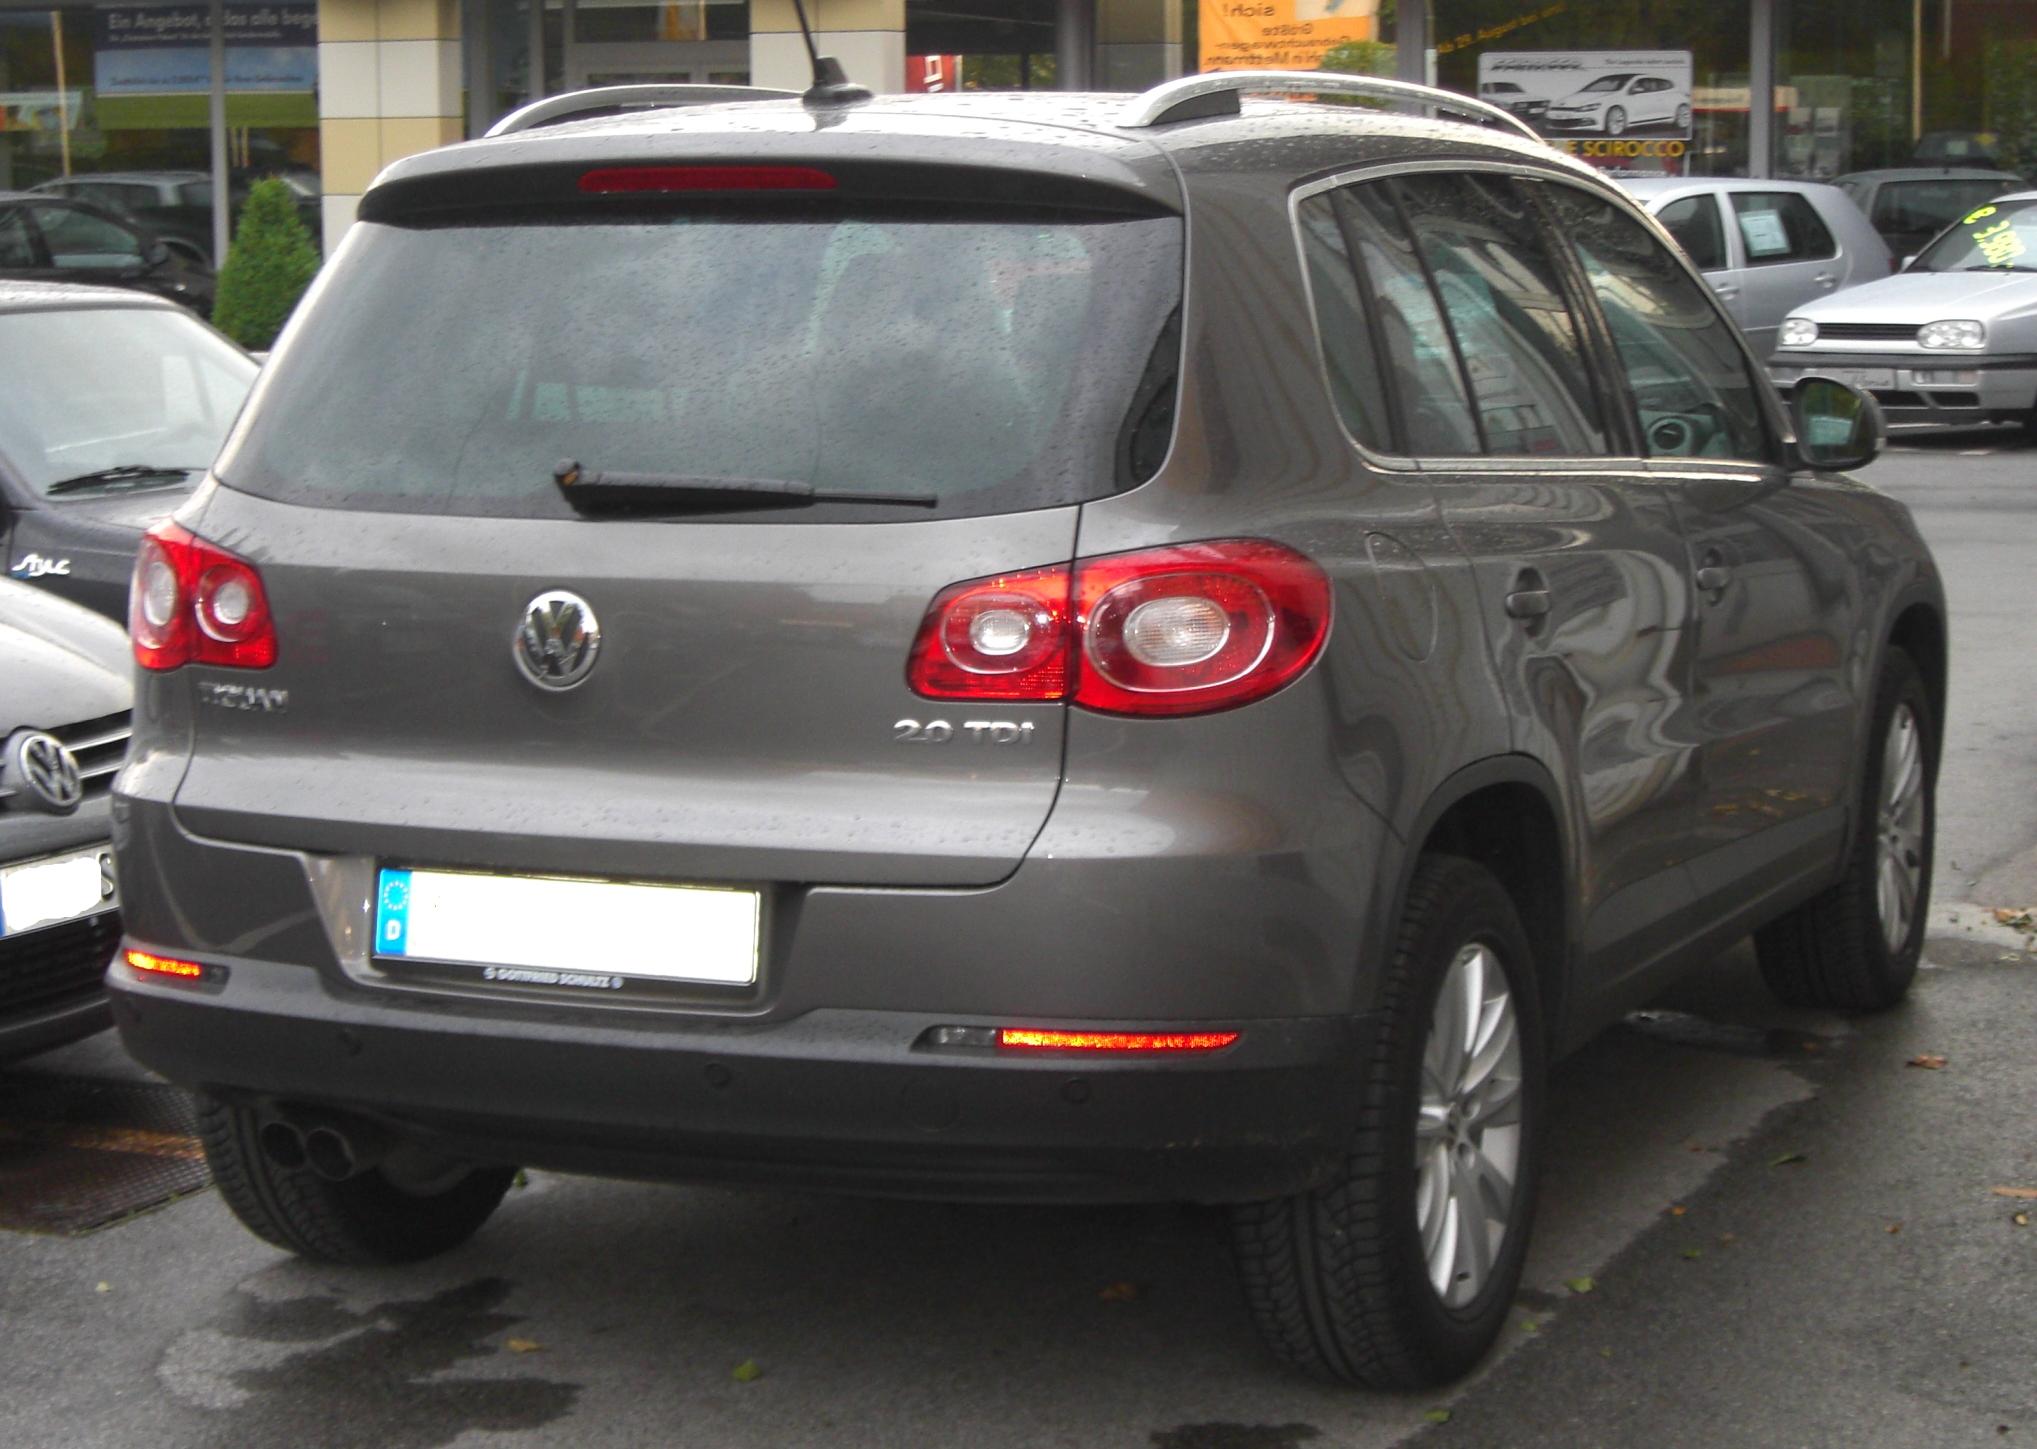 VW Tiguan 20 TDI technical details history photos on Better